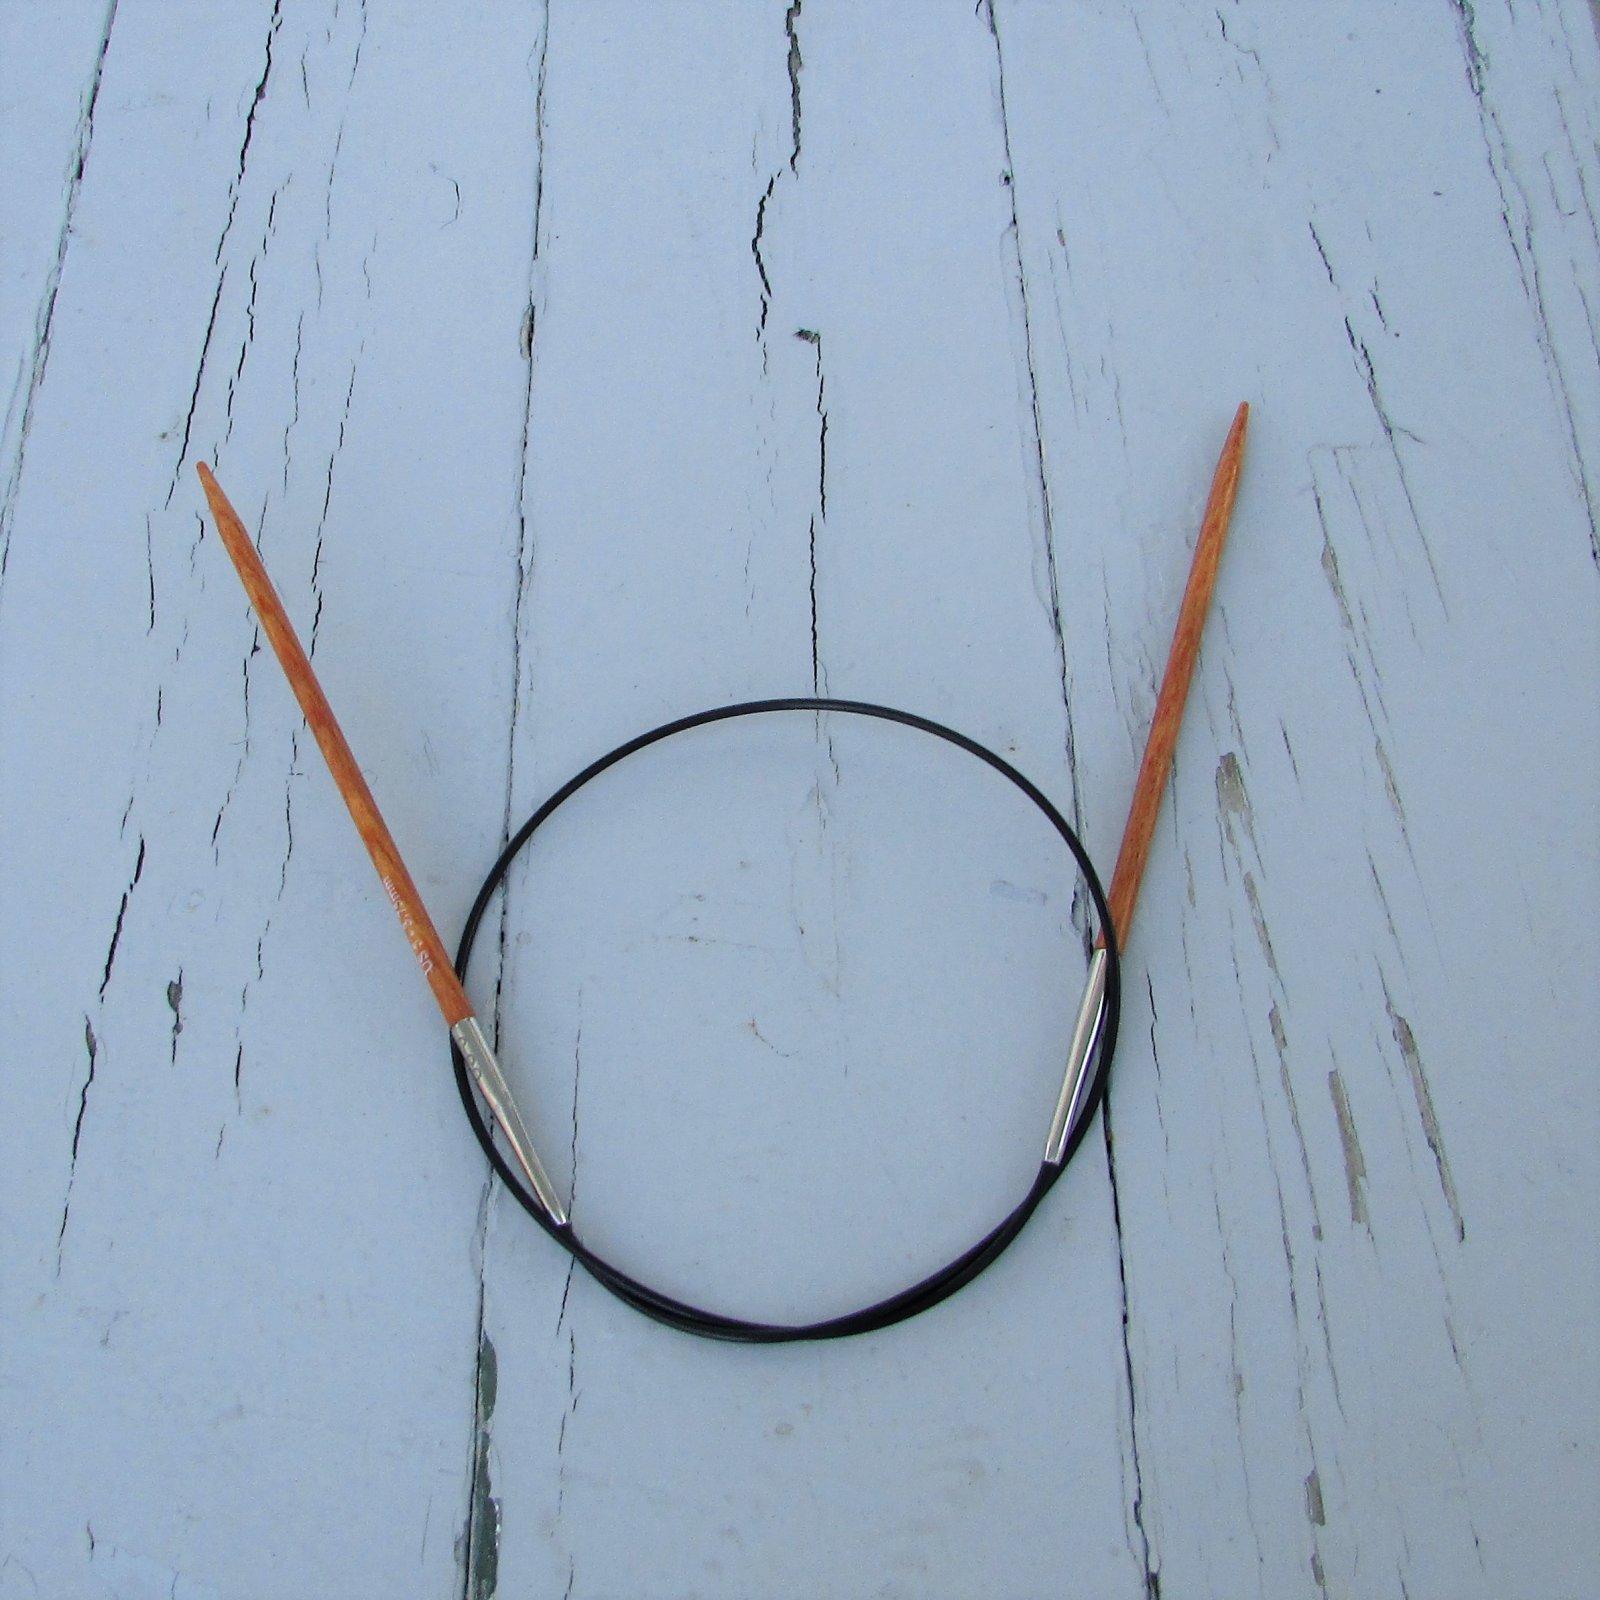 Knitter's Pride Symfonie Dreamz 24 Circular Needle